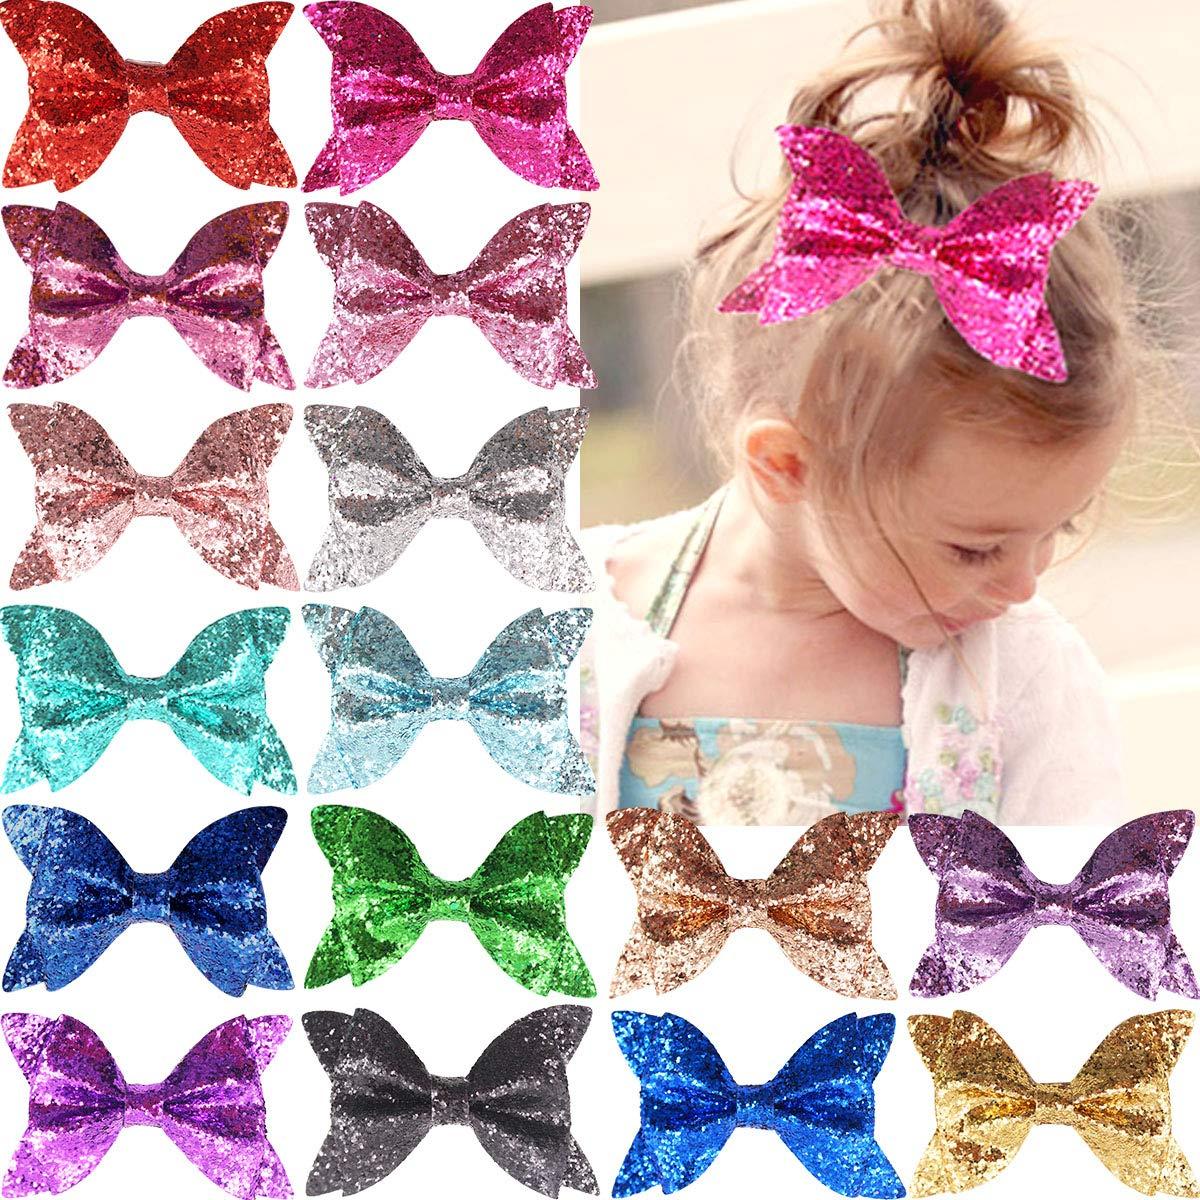 15 Pcs Baby Girls Hair Bows Clips Big Glitter Sequins 4